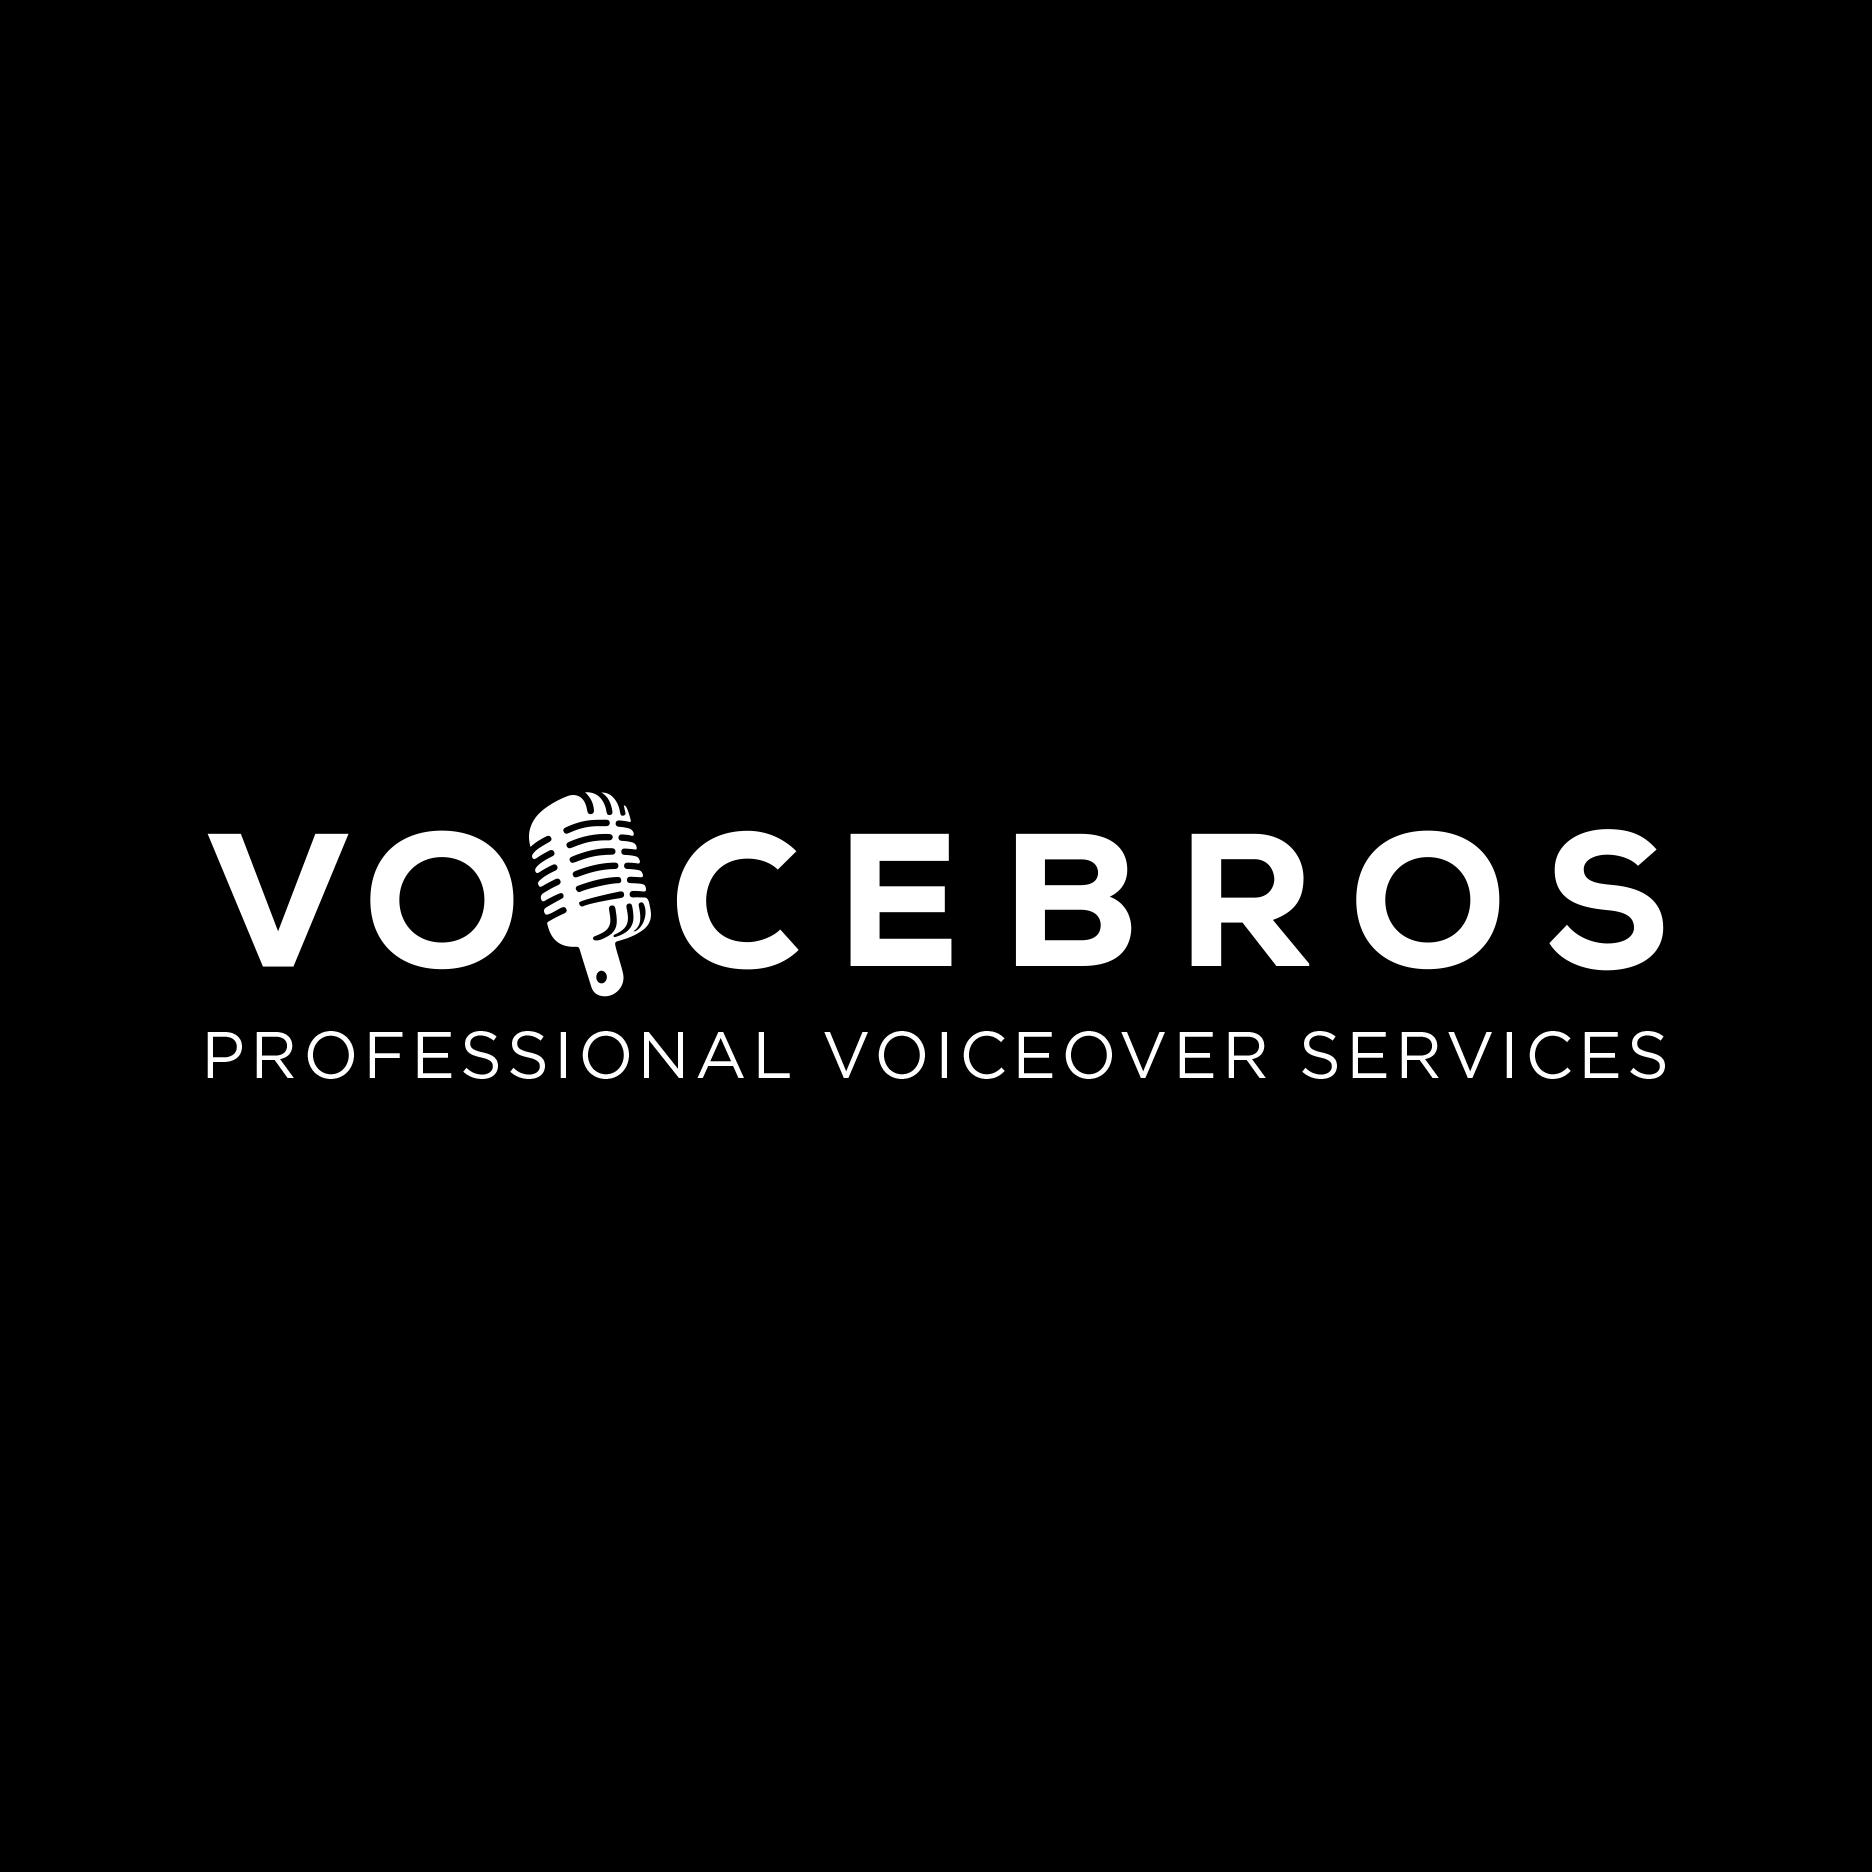 Mark Casademunt is a voice over actor